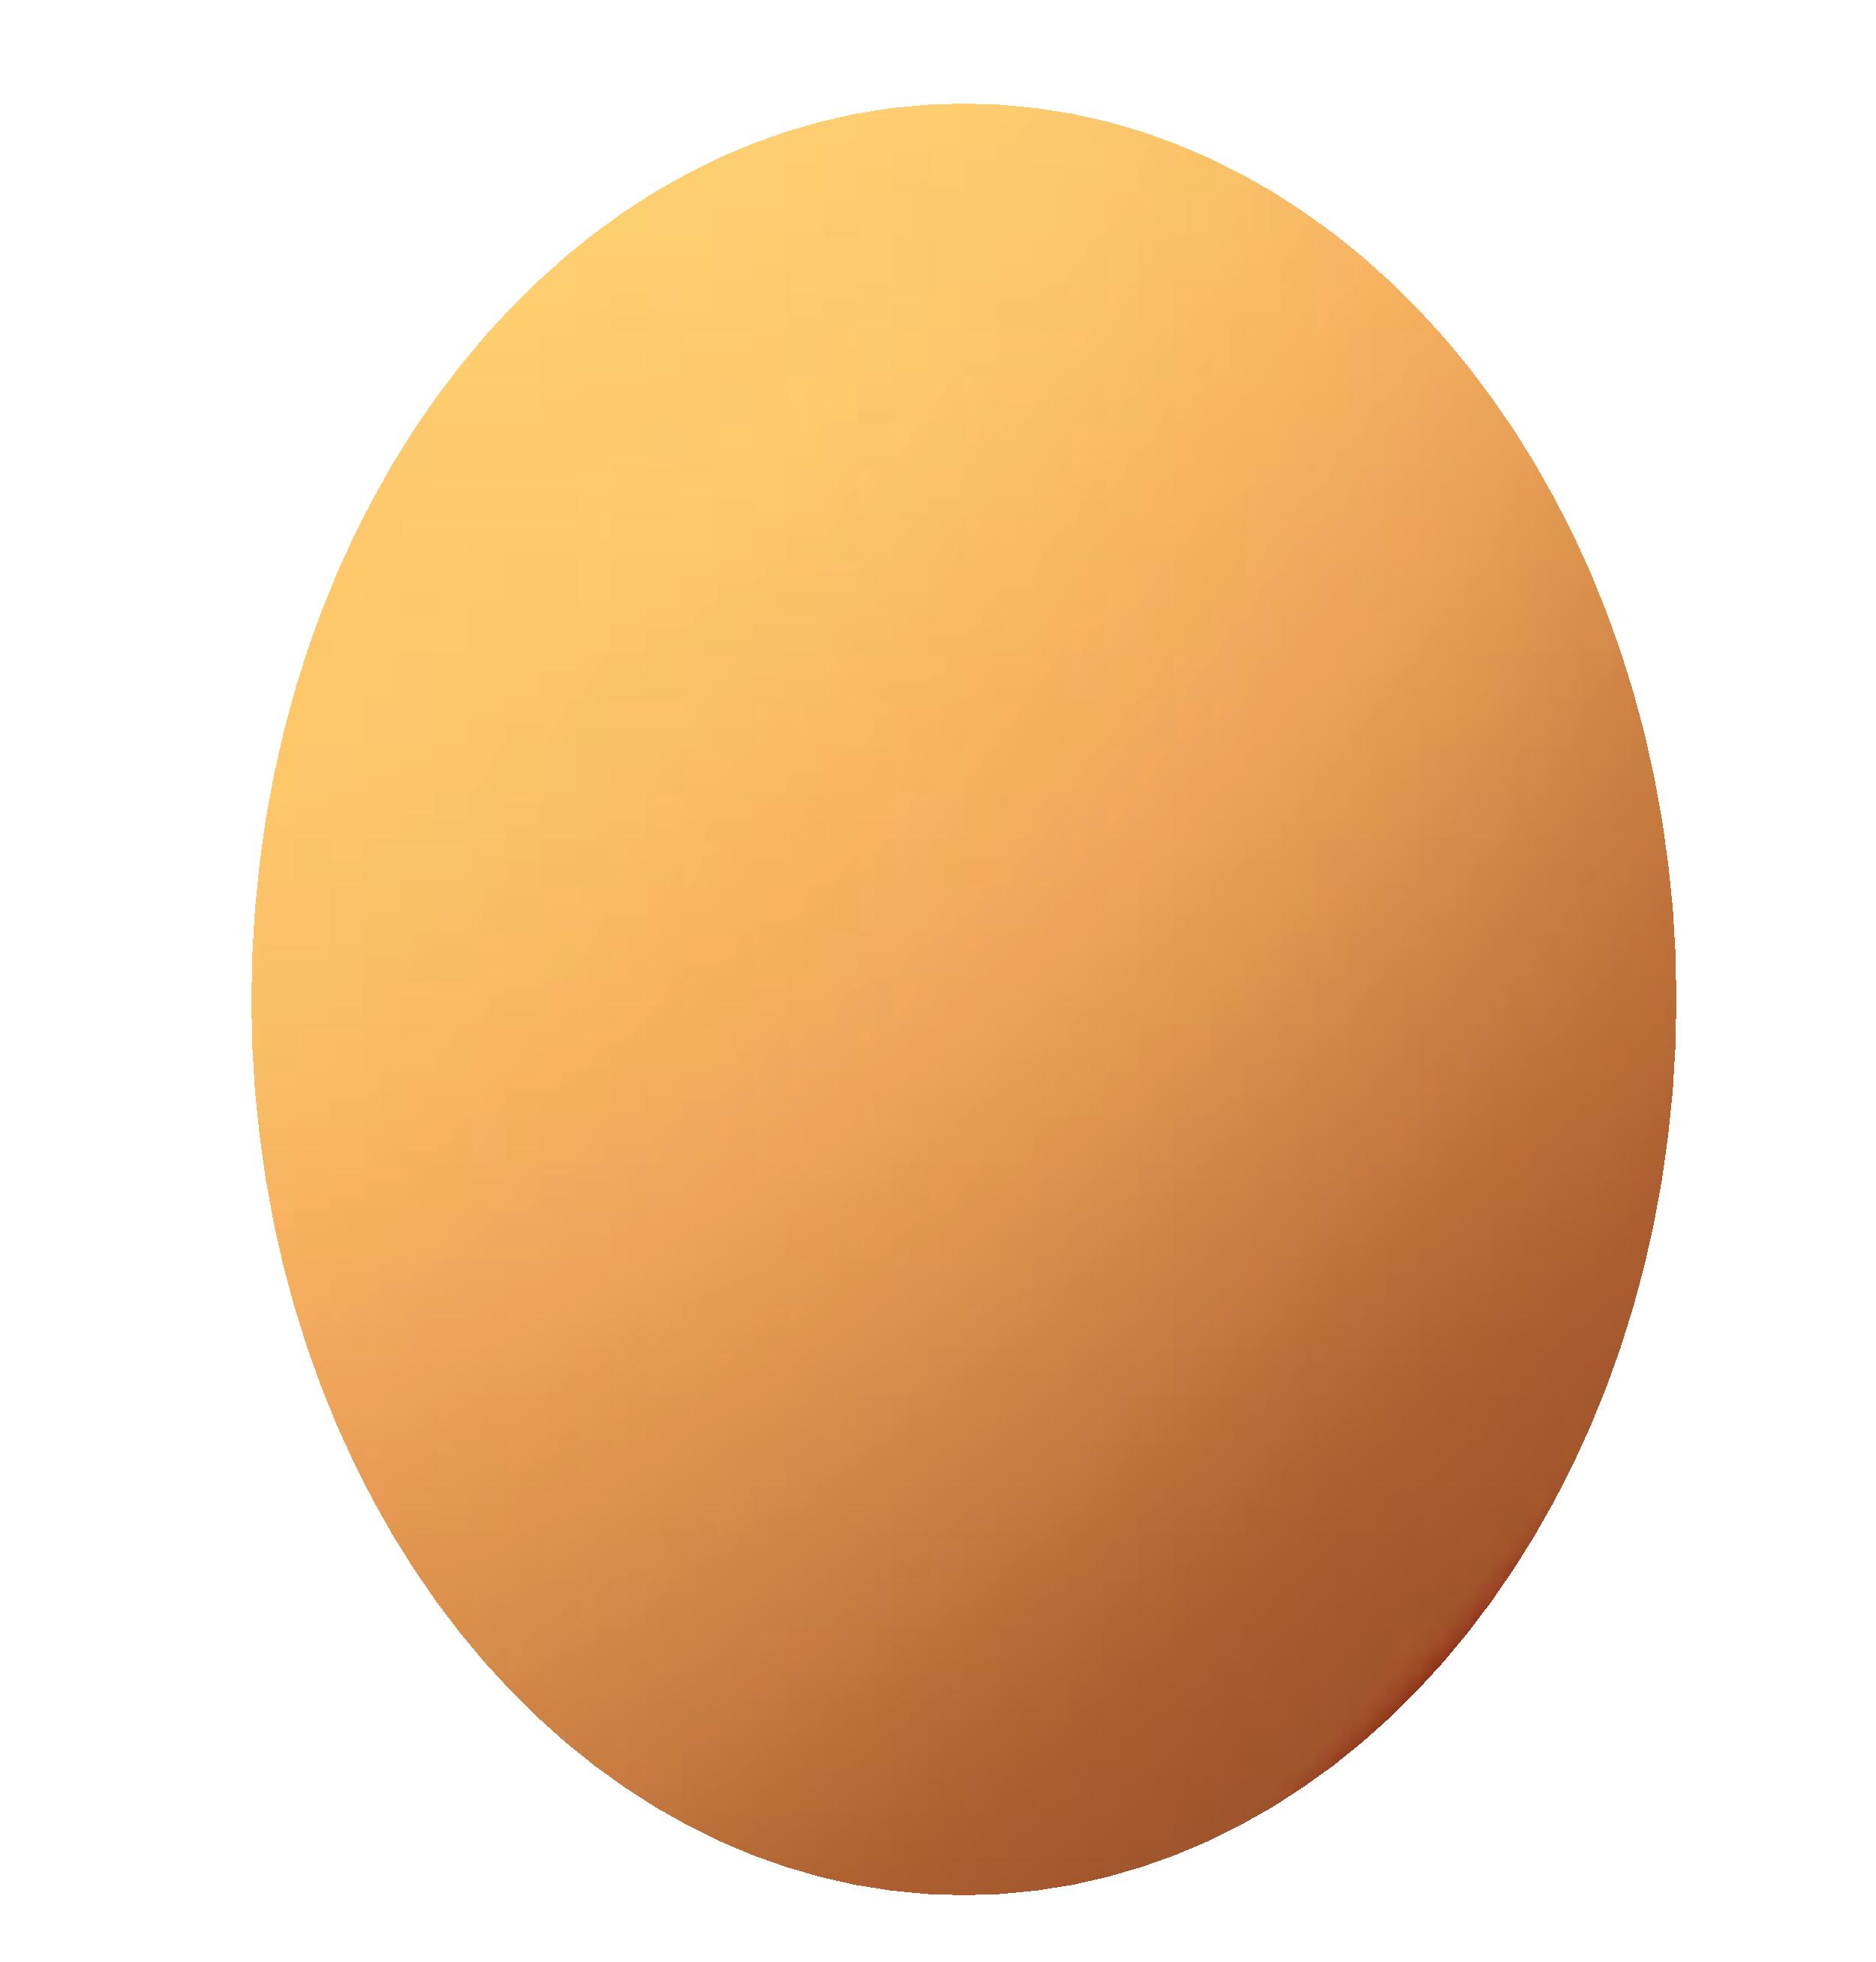 Eggs Png Image Eggs Decor Home Decor